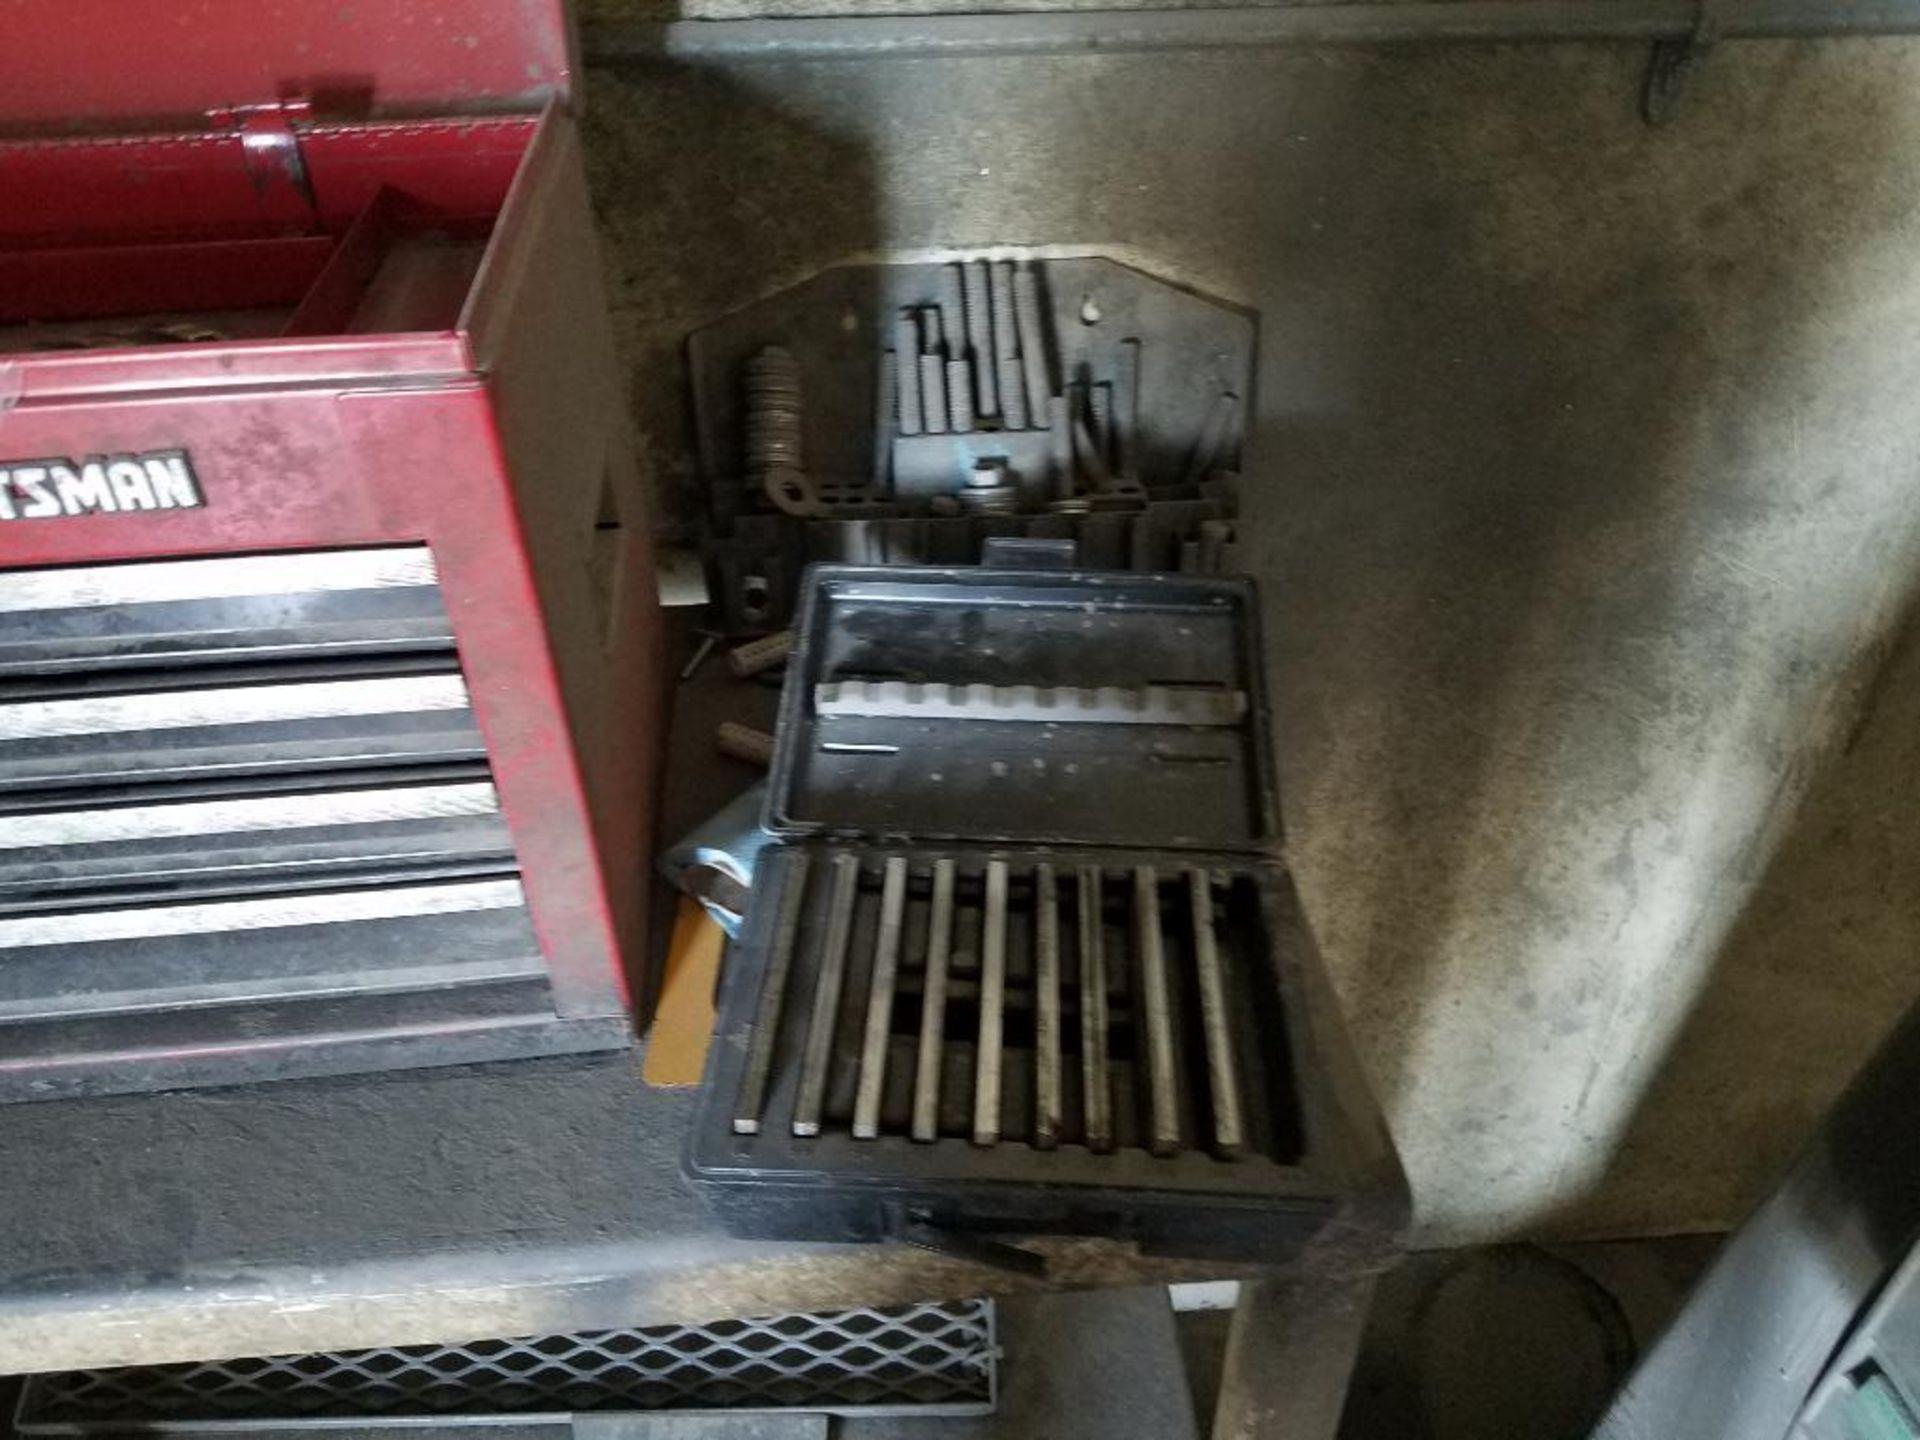 Bridgeport manual mill - Image 7 of 8